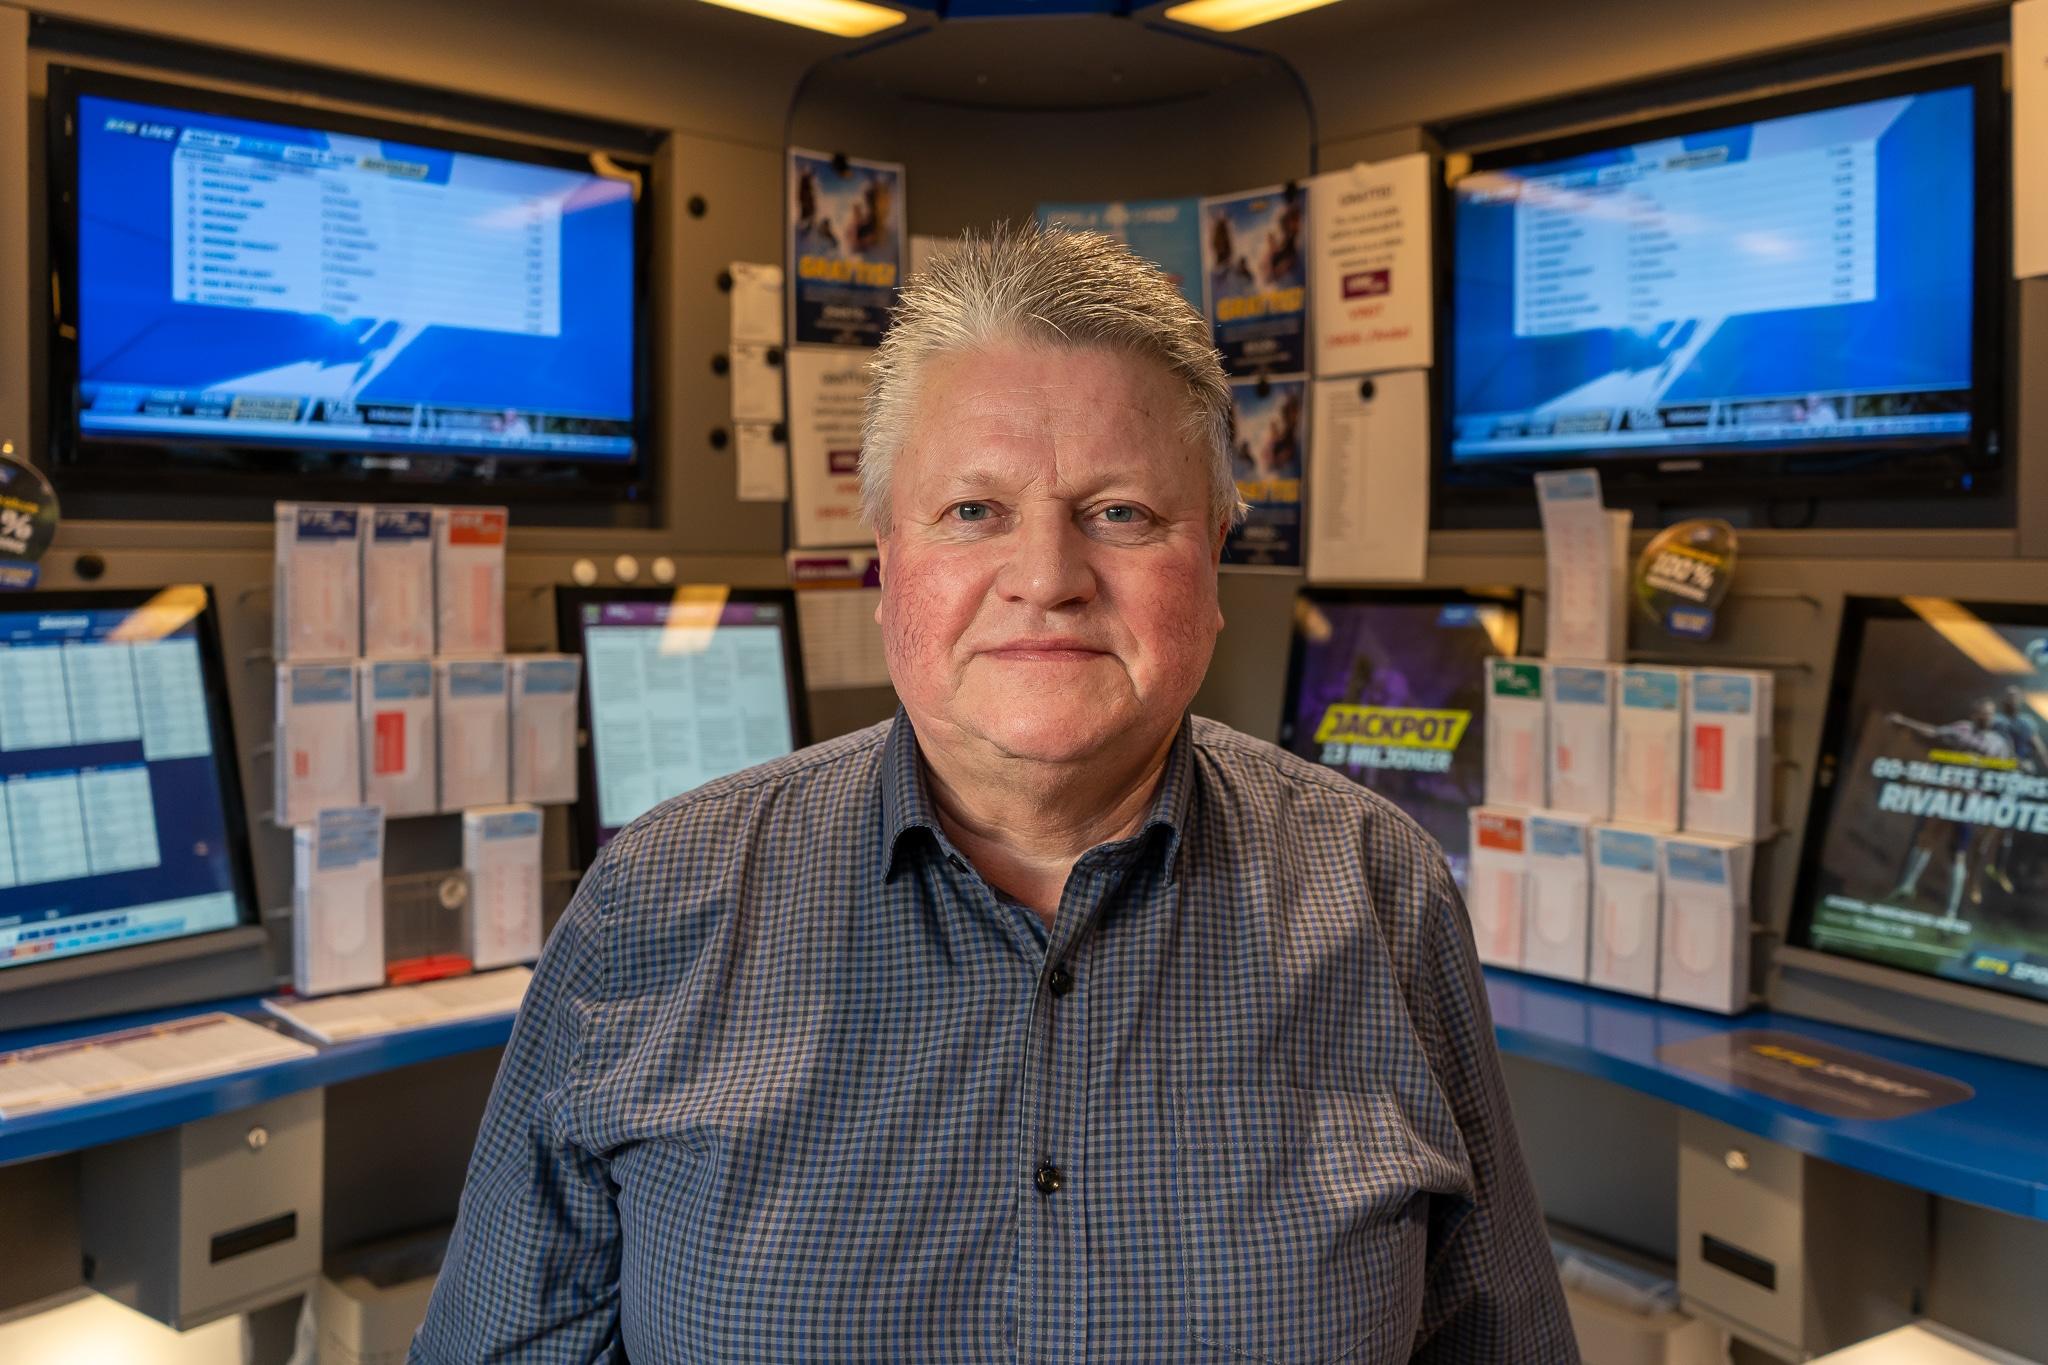 Bengt-Arne Baben Persson, spelexpert hos ICA Supermarket Sveg. Foto: Morgan Grip